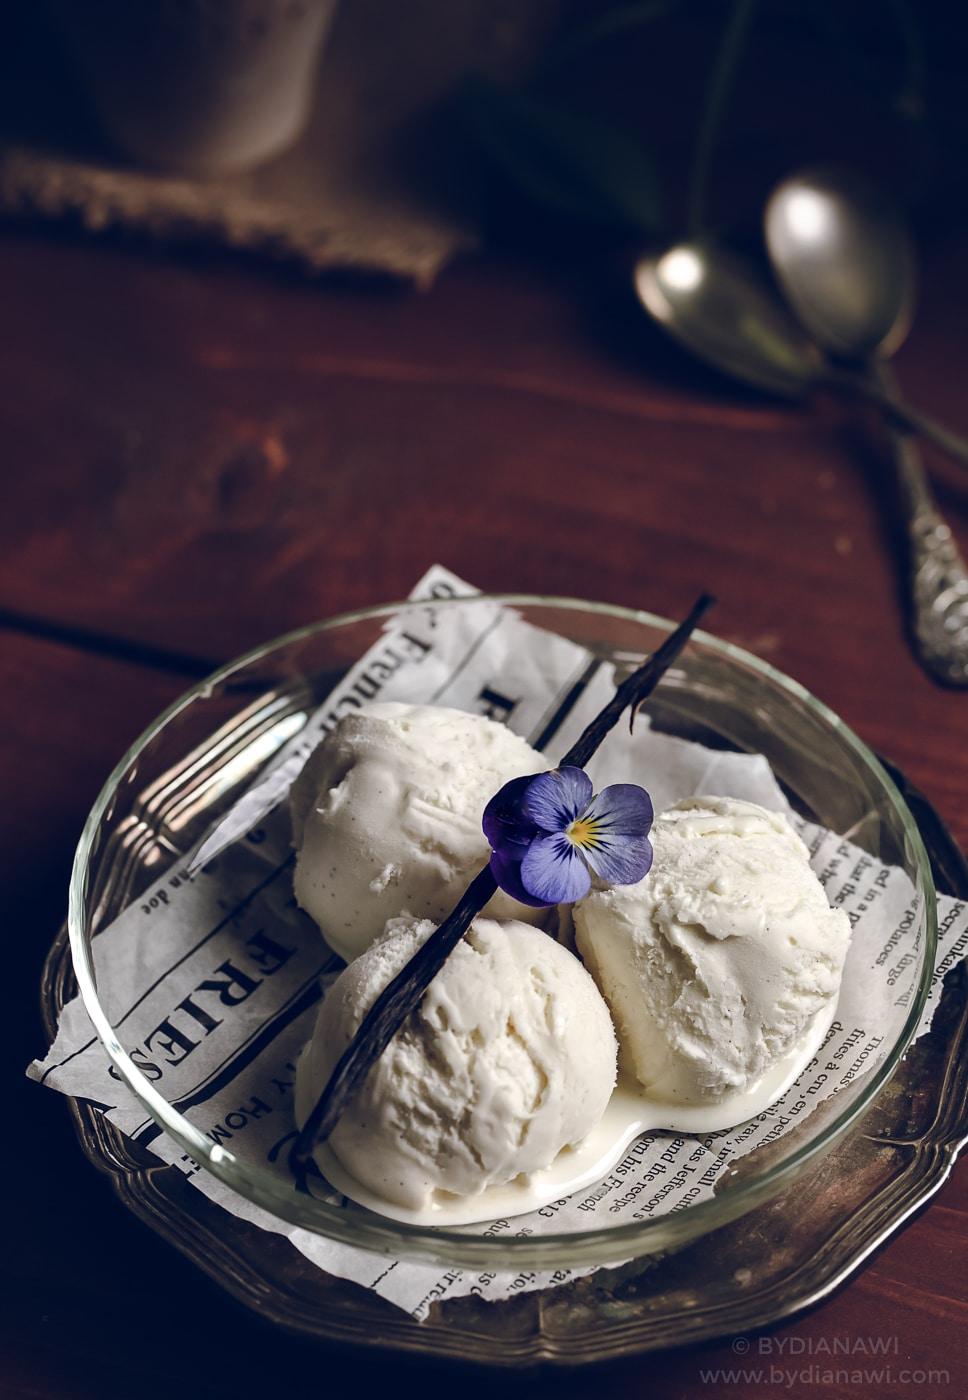 vaniljeis, vanilje is, ismaskine, mælkeis, hjemmelavet is opskrifter